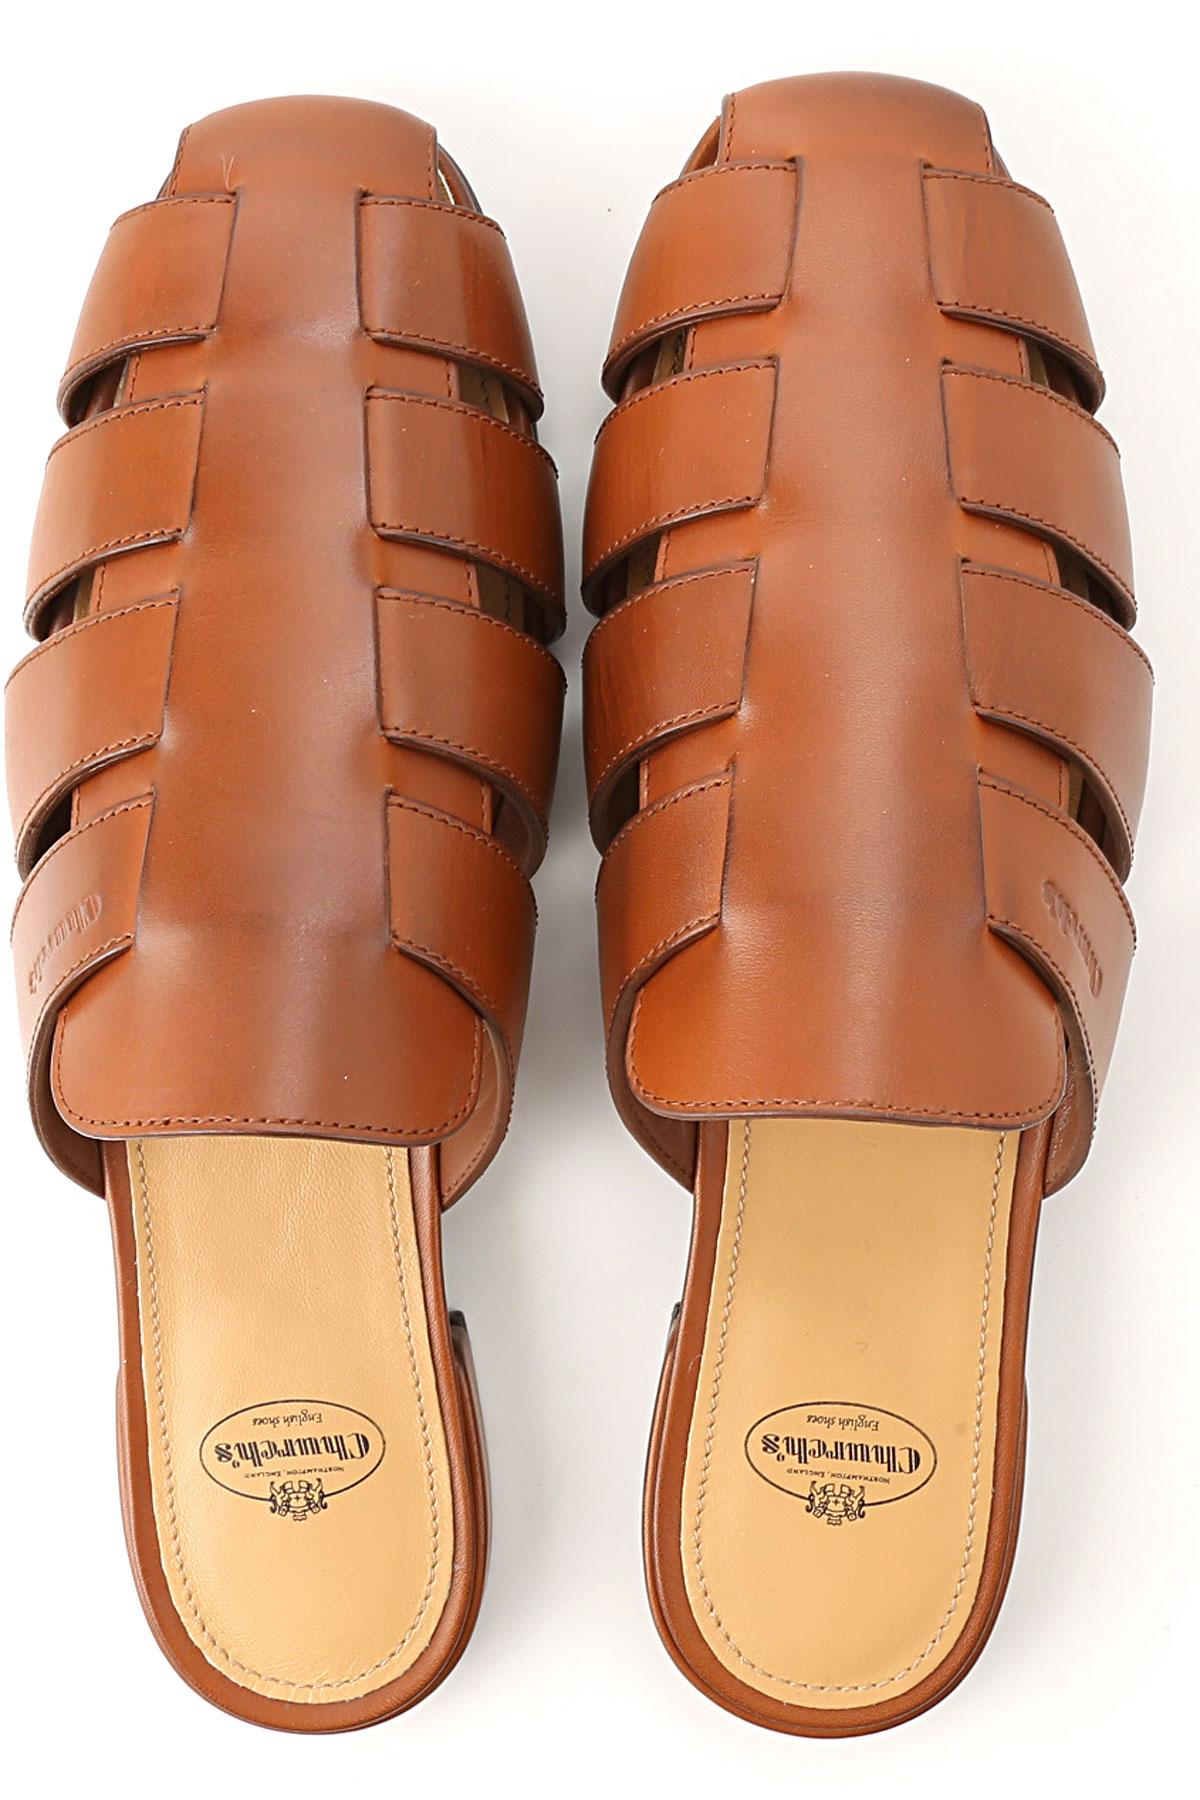 verano Primavera Tostado Zapatos Para Mujer nbsp; 2019 Church's qIxPgtBwB